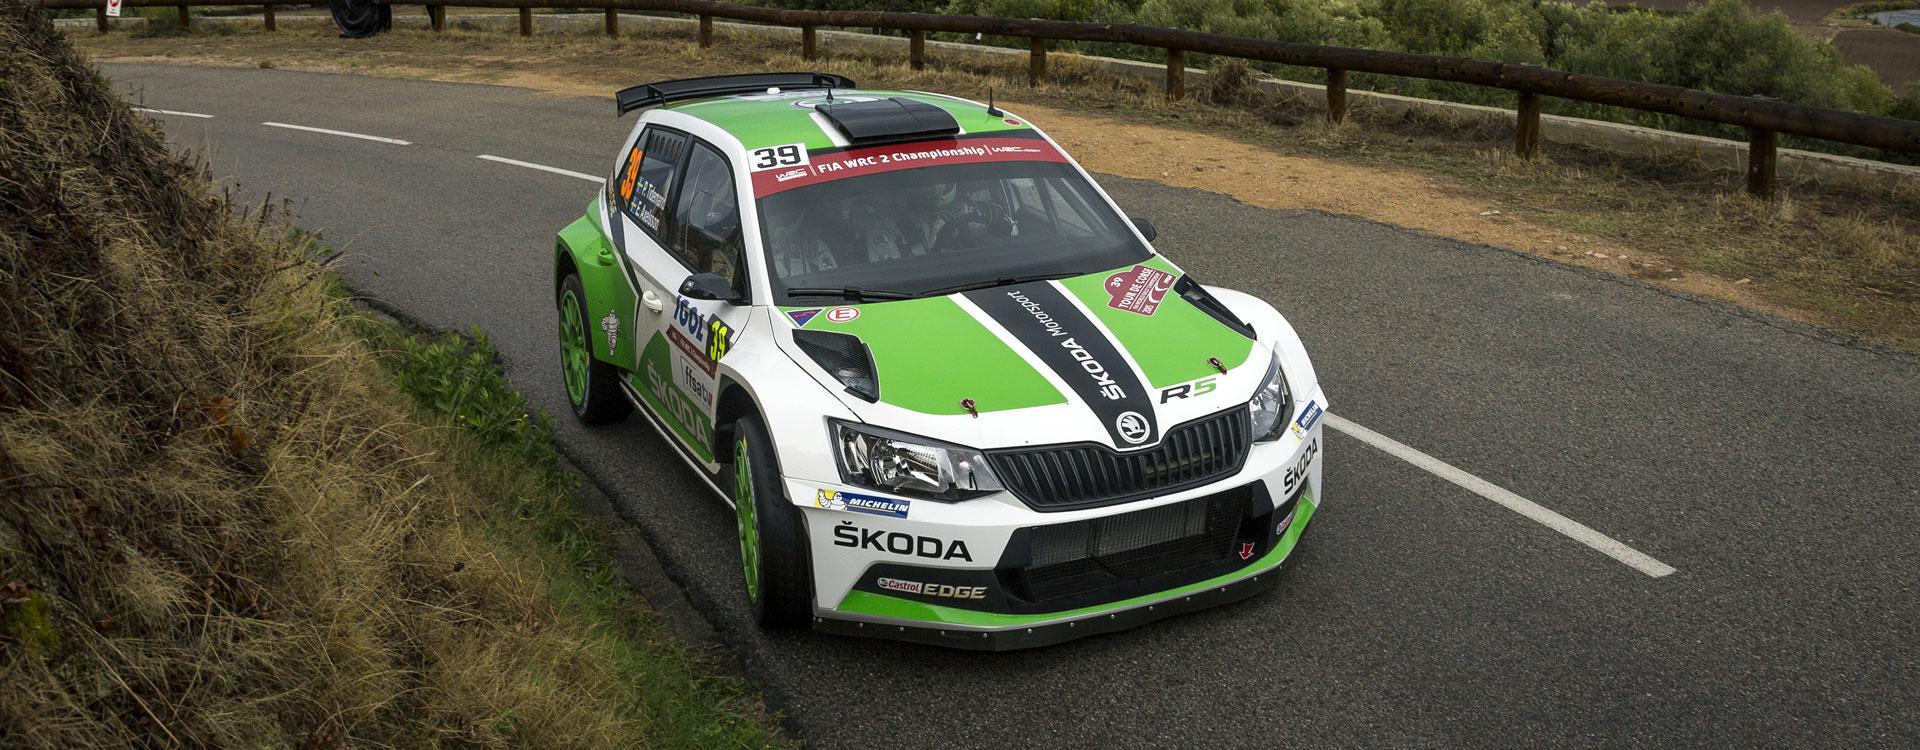 video tour de corse rallye de france 2016 preview video koda motorsport. Black Bedroom Furniture Sets. Home Design Ideas